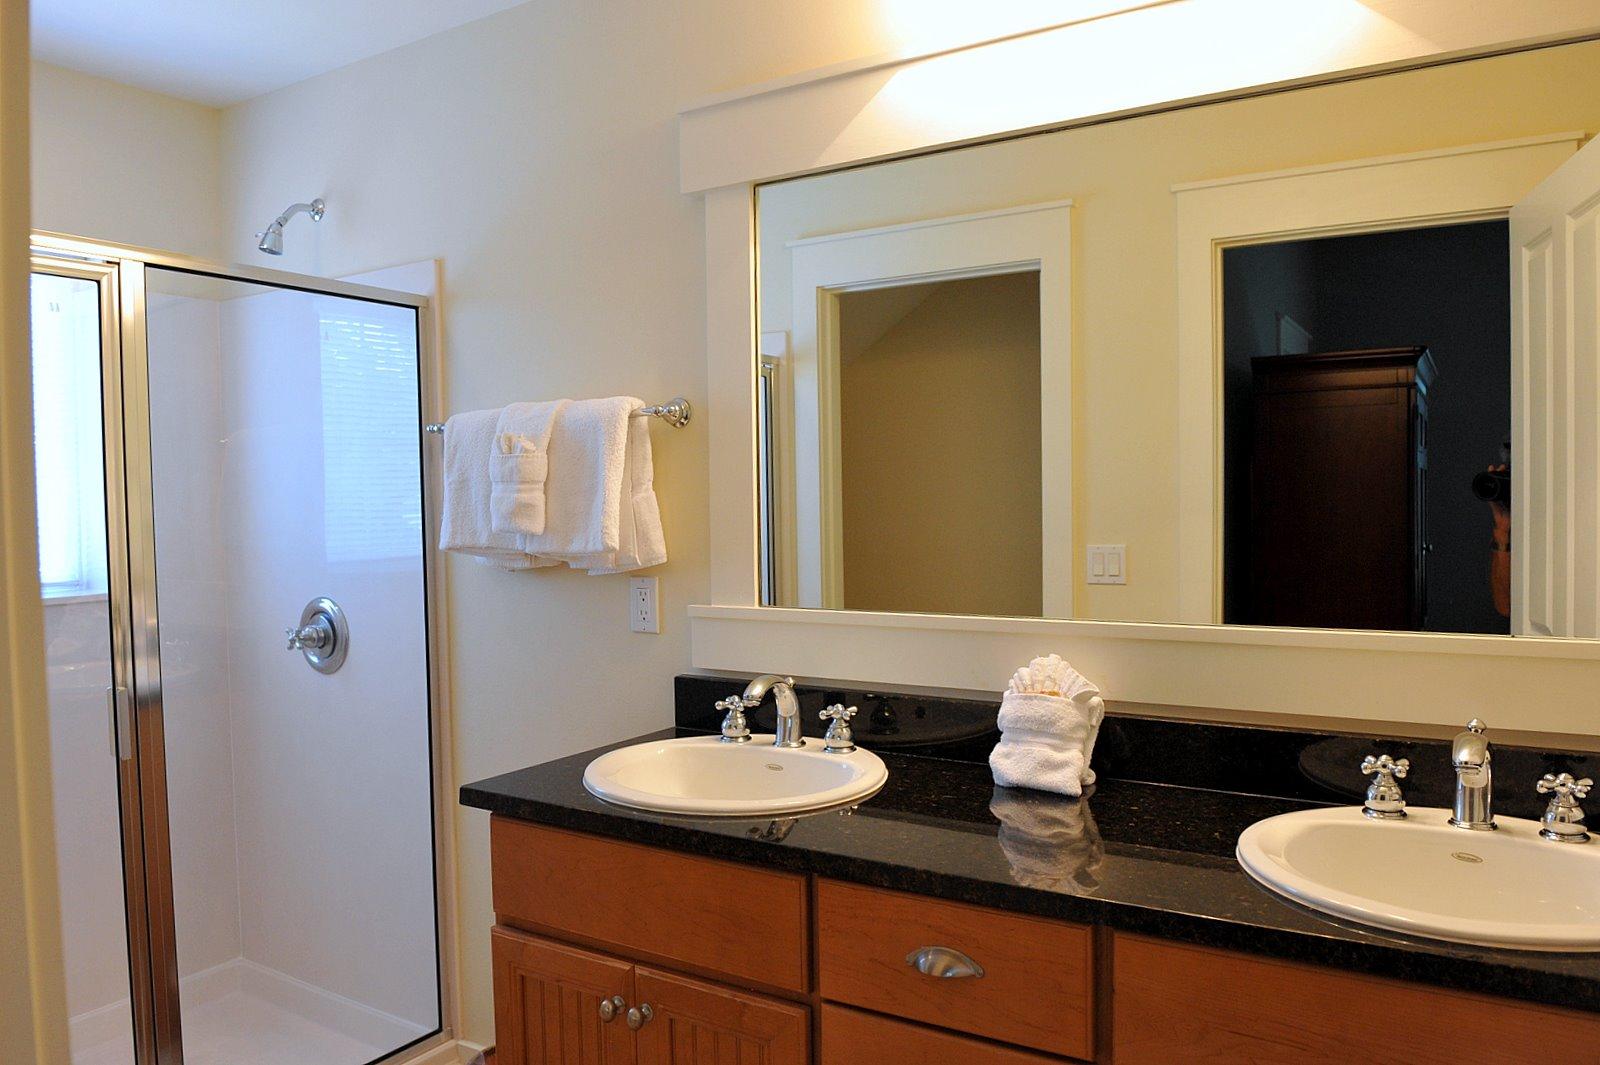 1280 Laurel Grove Condo rental in Sandestin Rentals ~ Cottages and Villas  in Destin Florida - #22